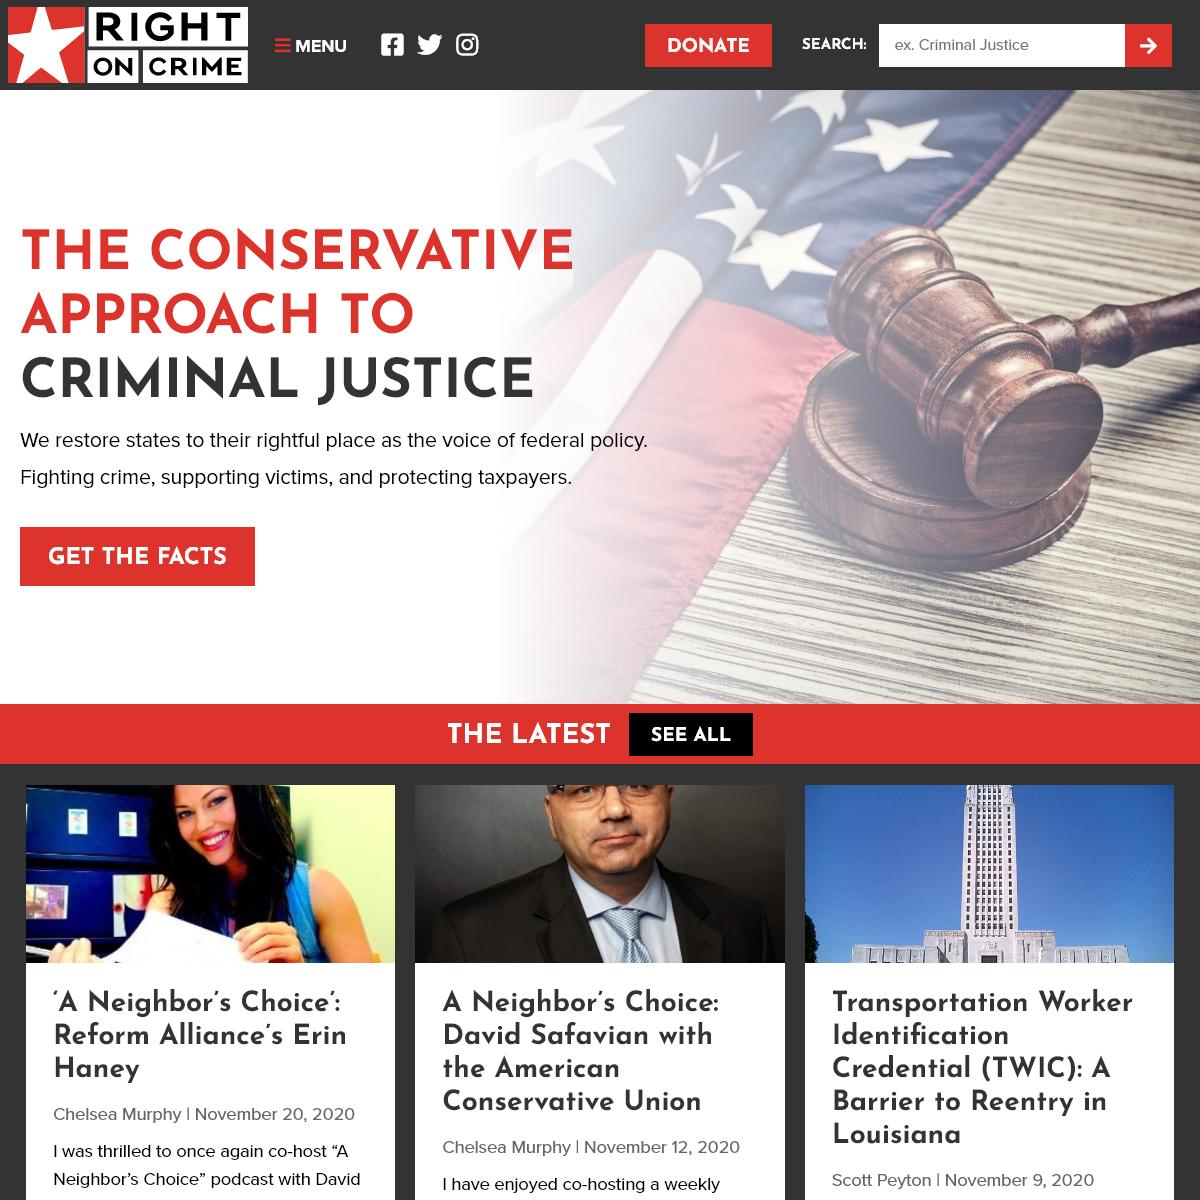 Home - Right on CrimeRight on Crime